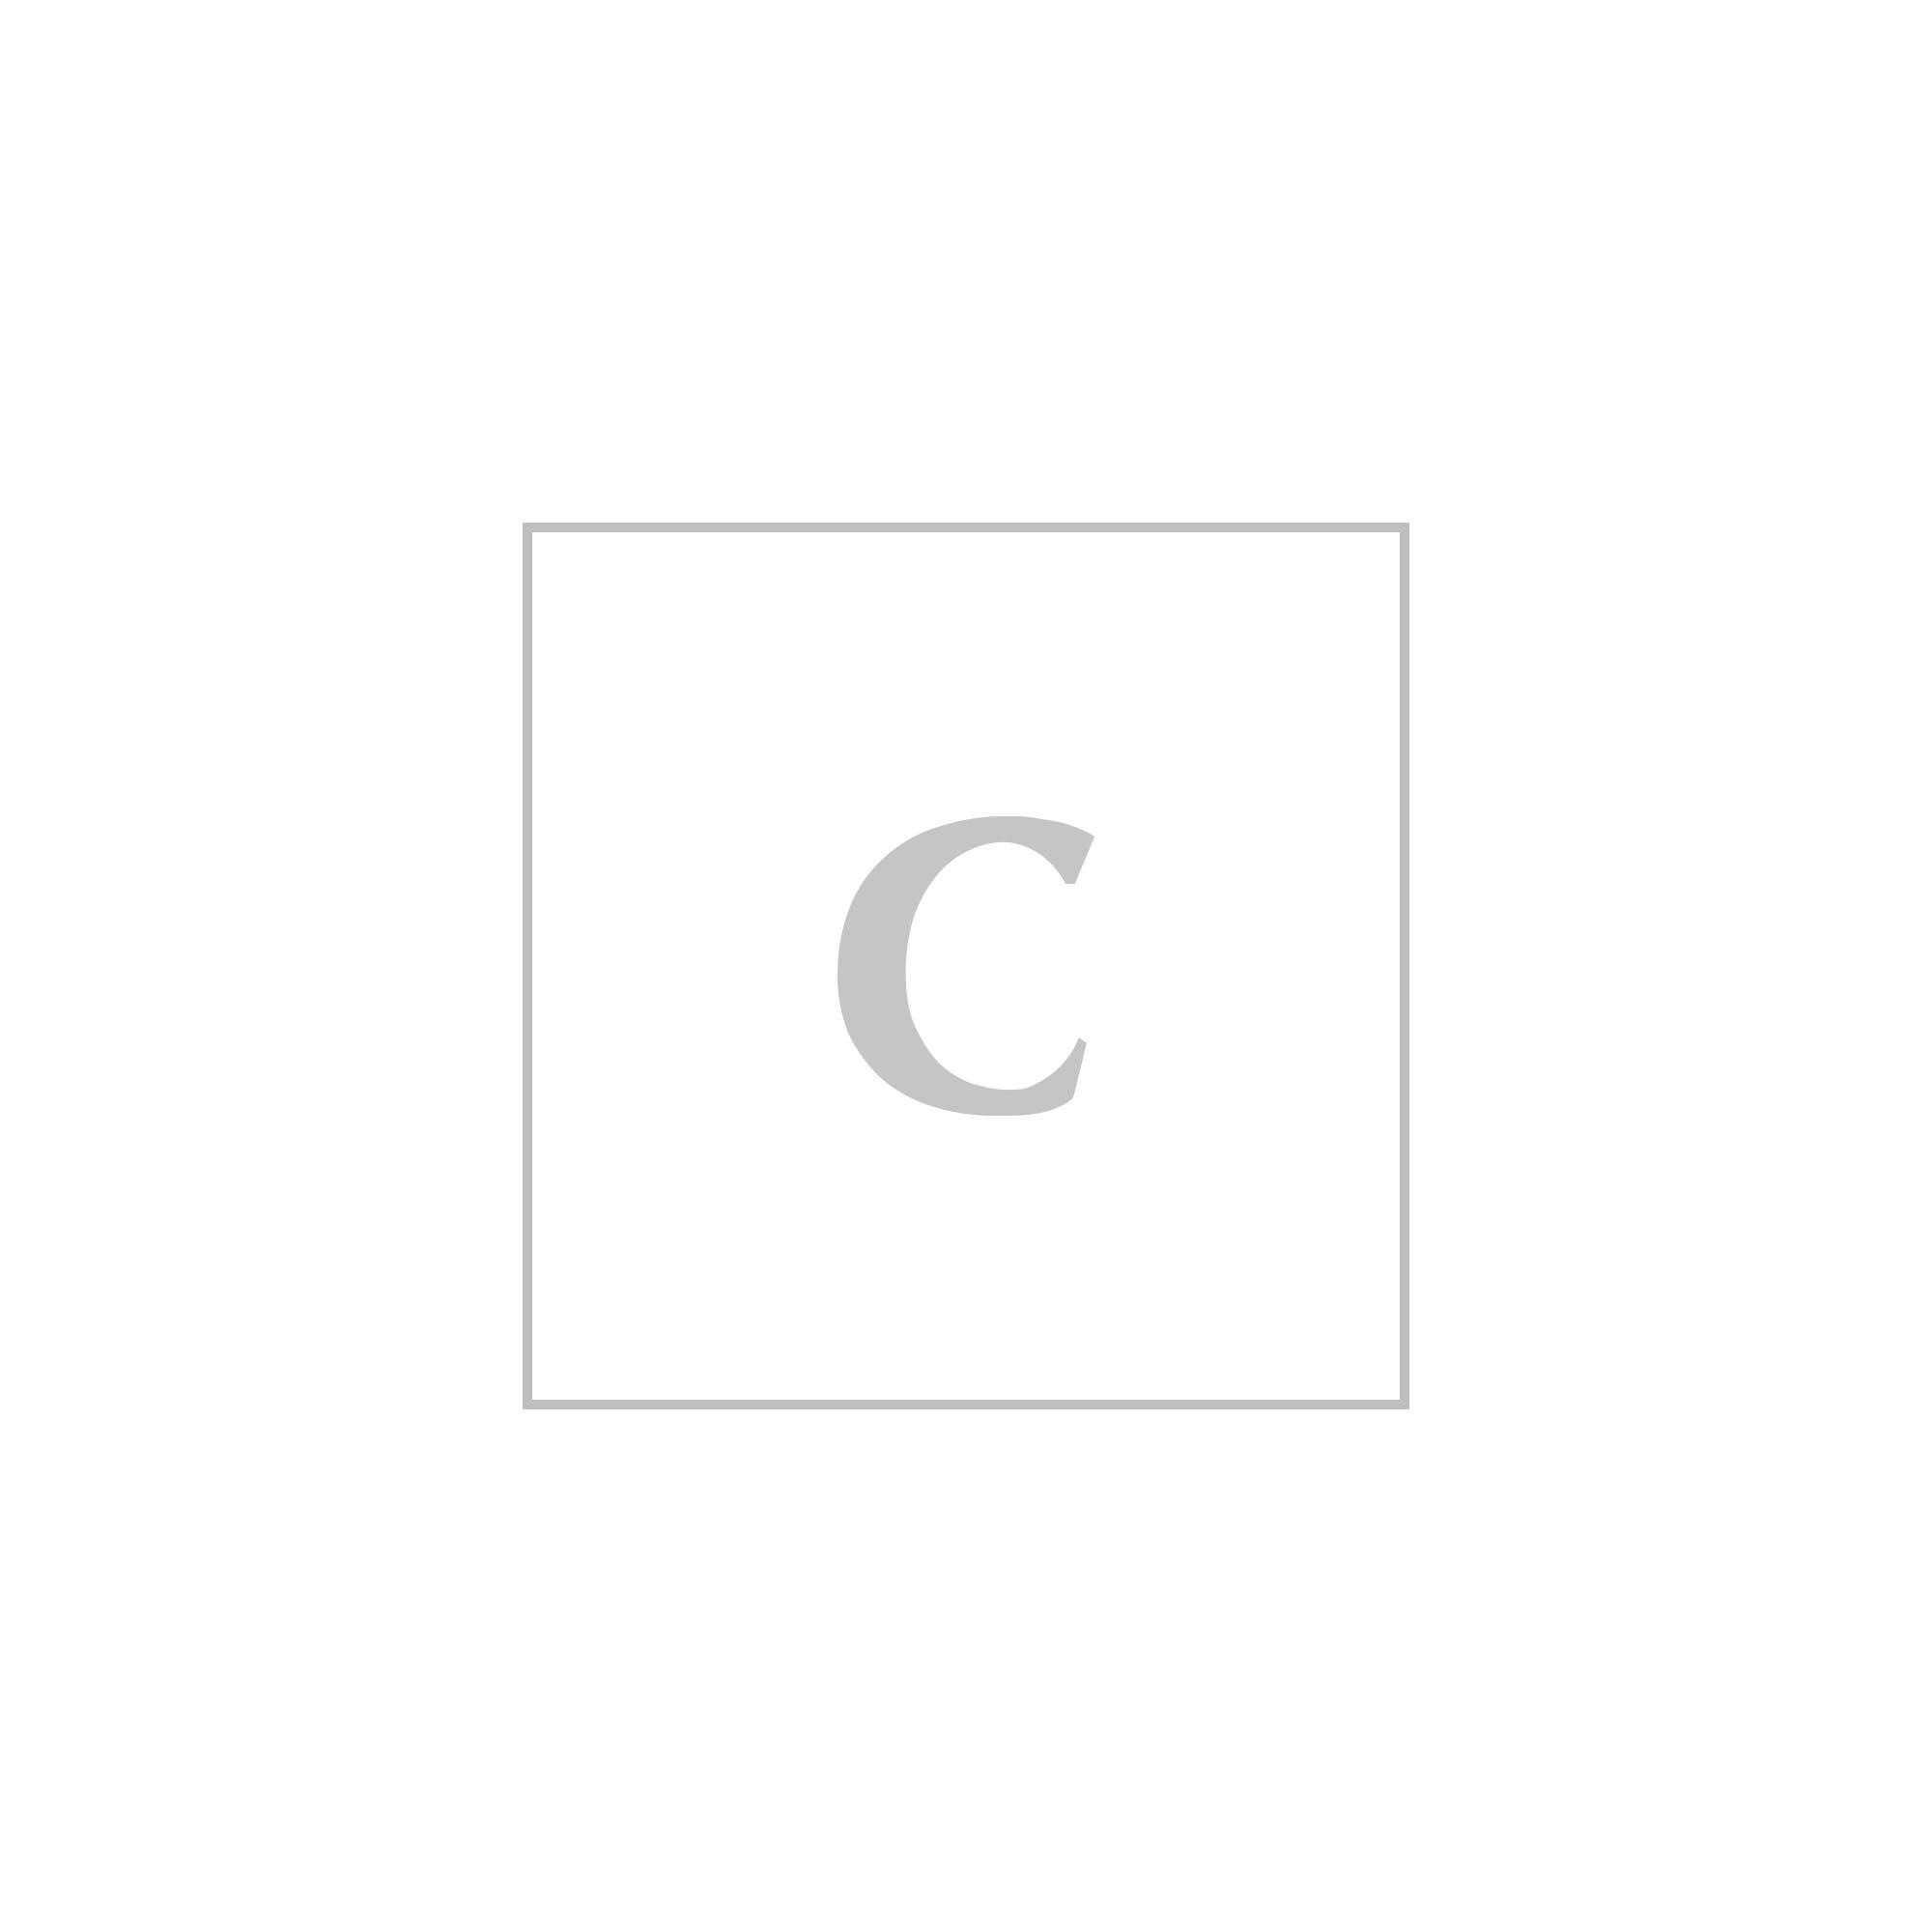 Dolce & gabbana dauphine calfskin briefcase